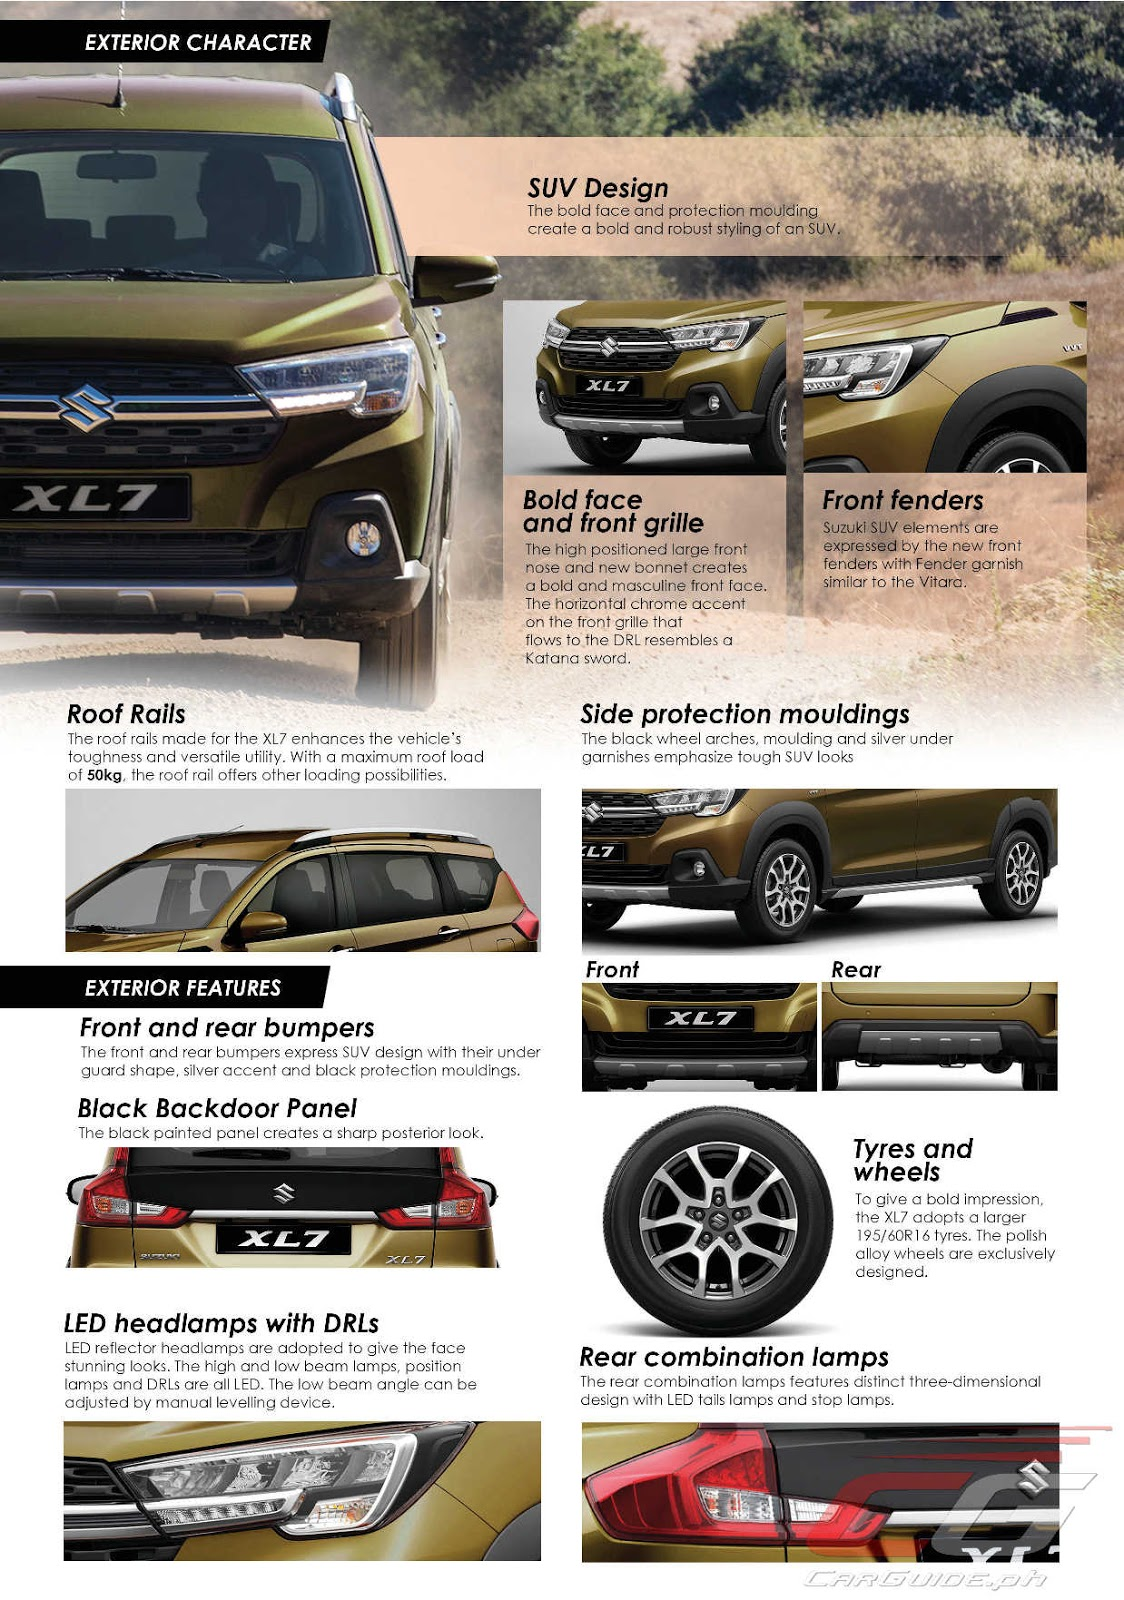 could the p 1 068m 2020 suzuki xl7 stir up the 7 seater small suv segment w specs brochure carguide ph philippine car news car reviews car prices could the p 1 068m 2020 suzuki xl7 stir